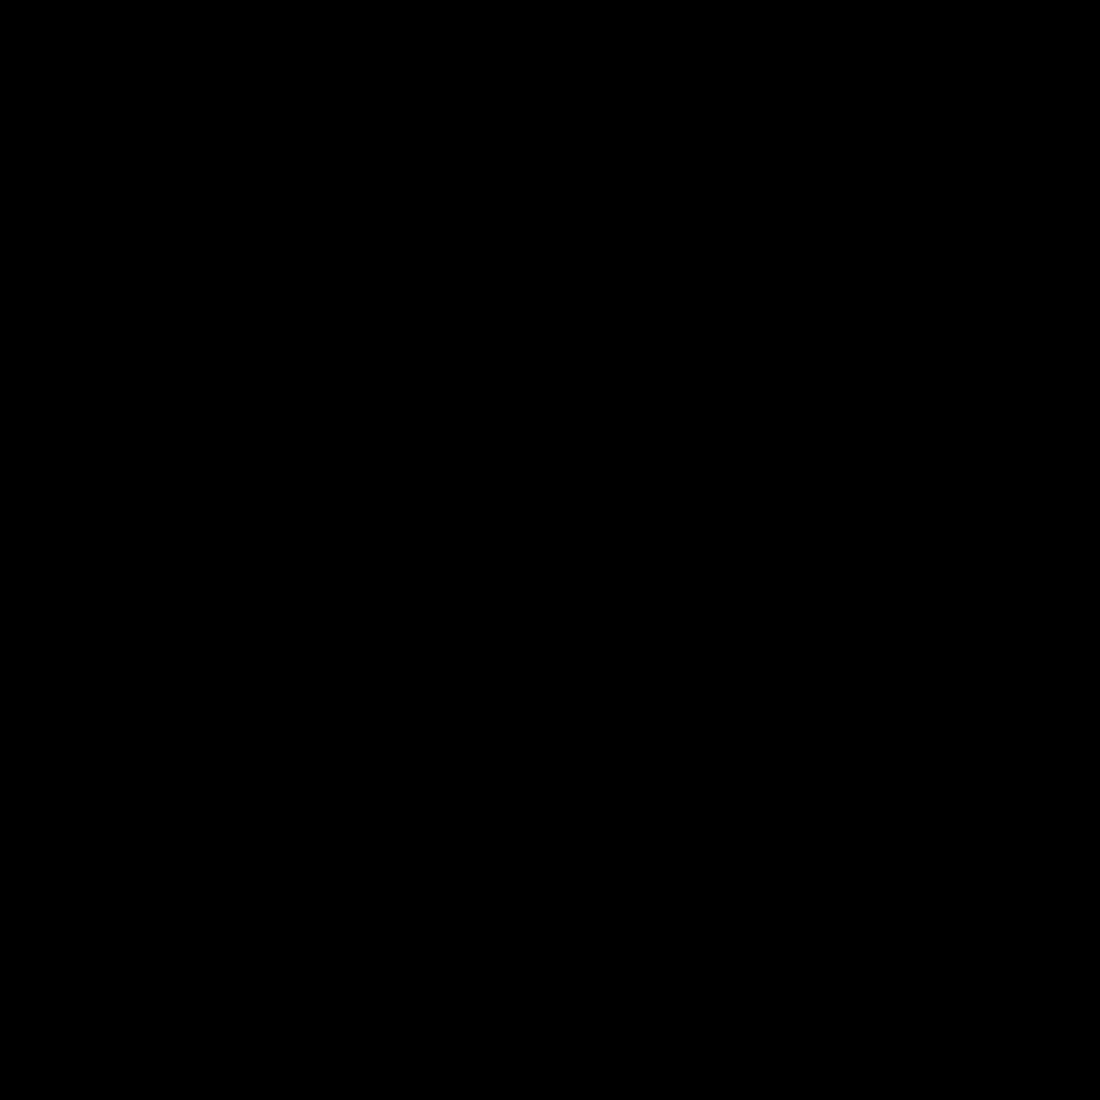 Pixilart Anti Demon Possession Symbol Supernatural By Alpha Kaos